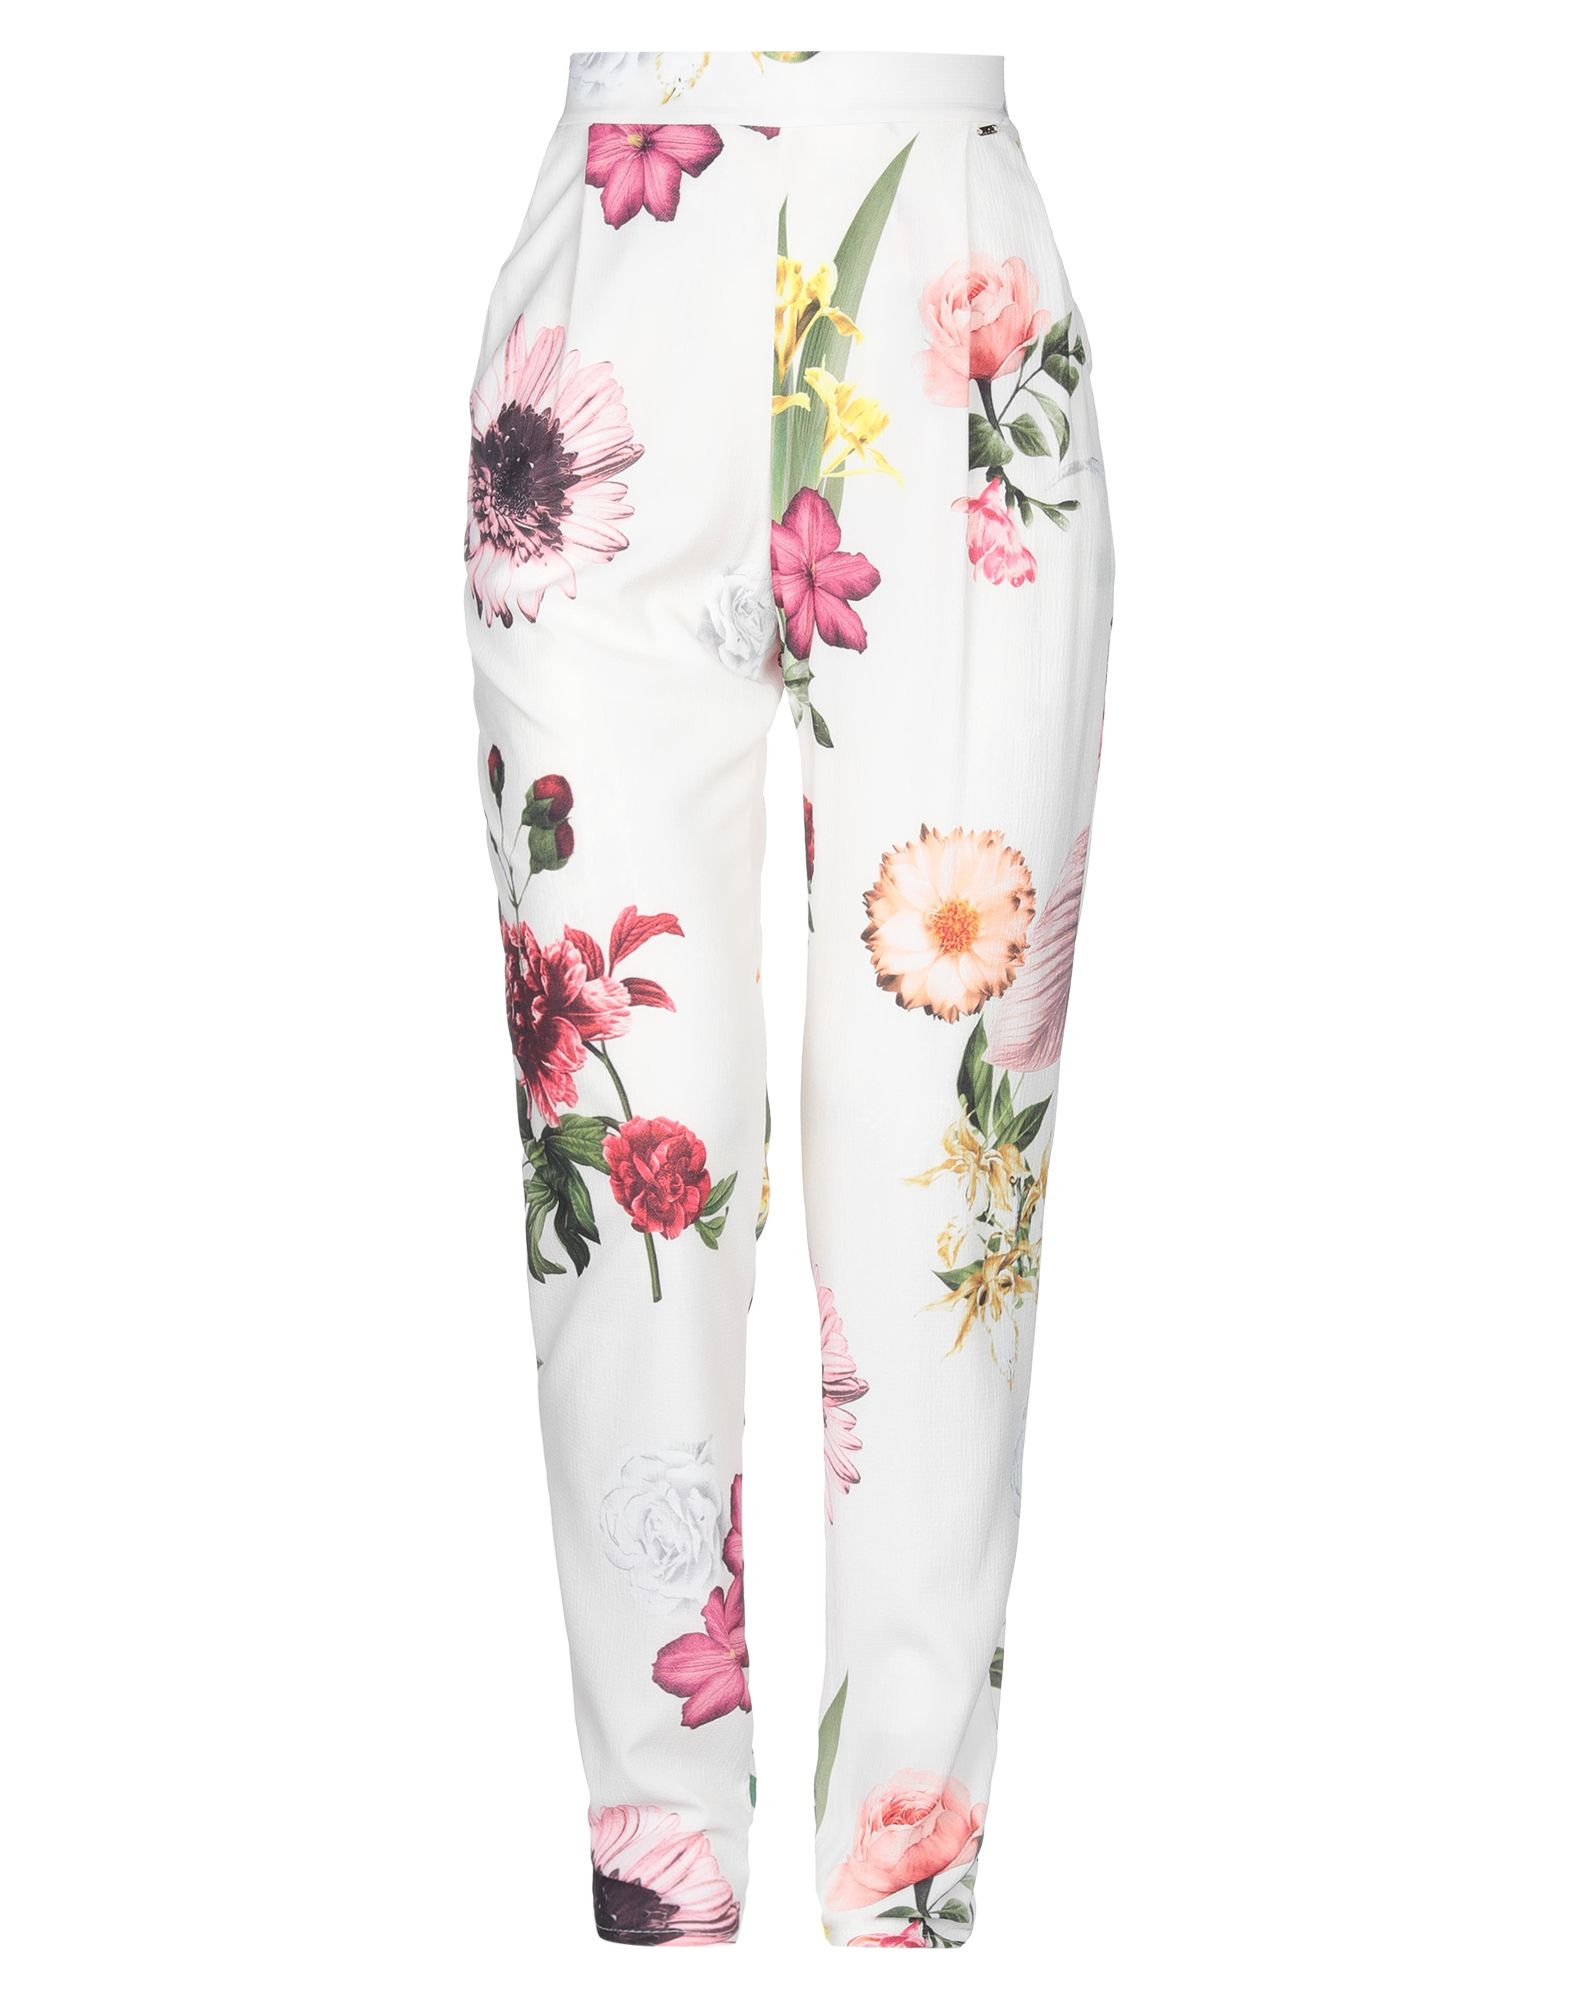 MDM MADEMOISELLE DU MONDE Повседневные брюки колготки mademoiselle mademoiselle mp002xw0h5gg